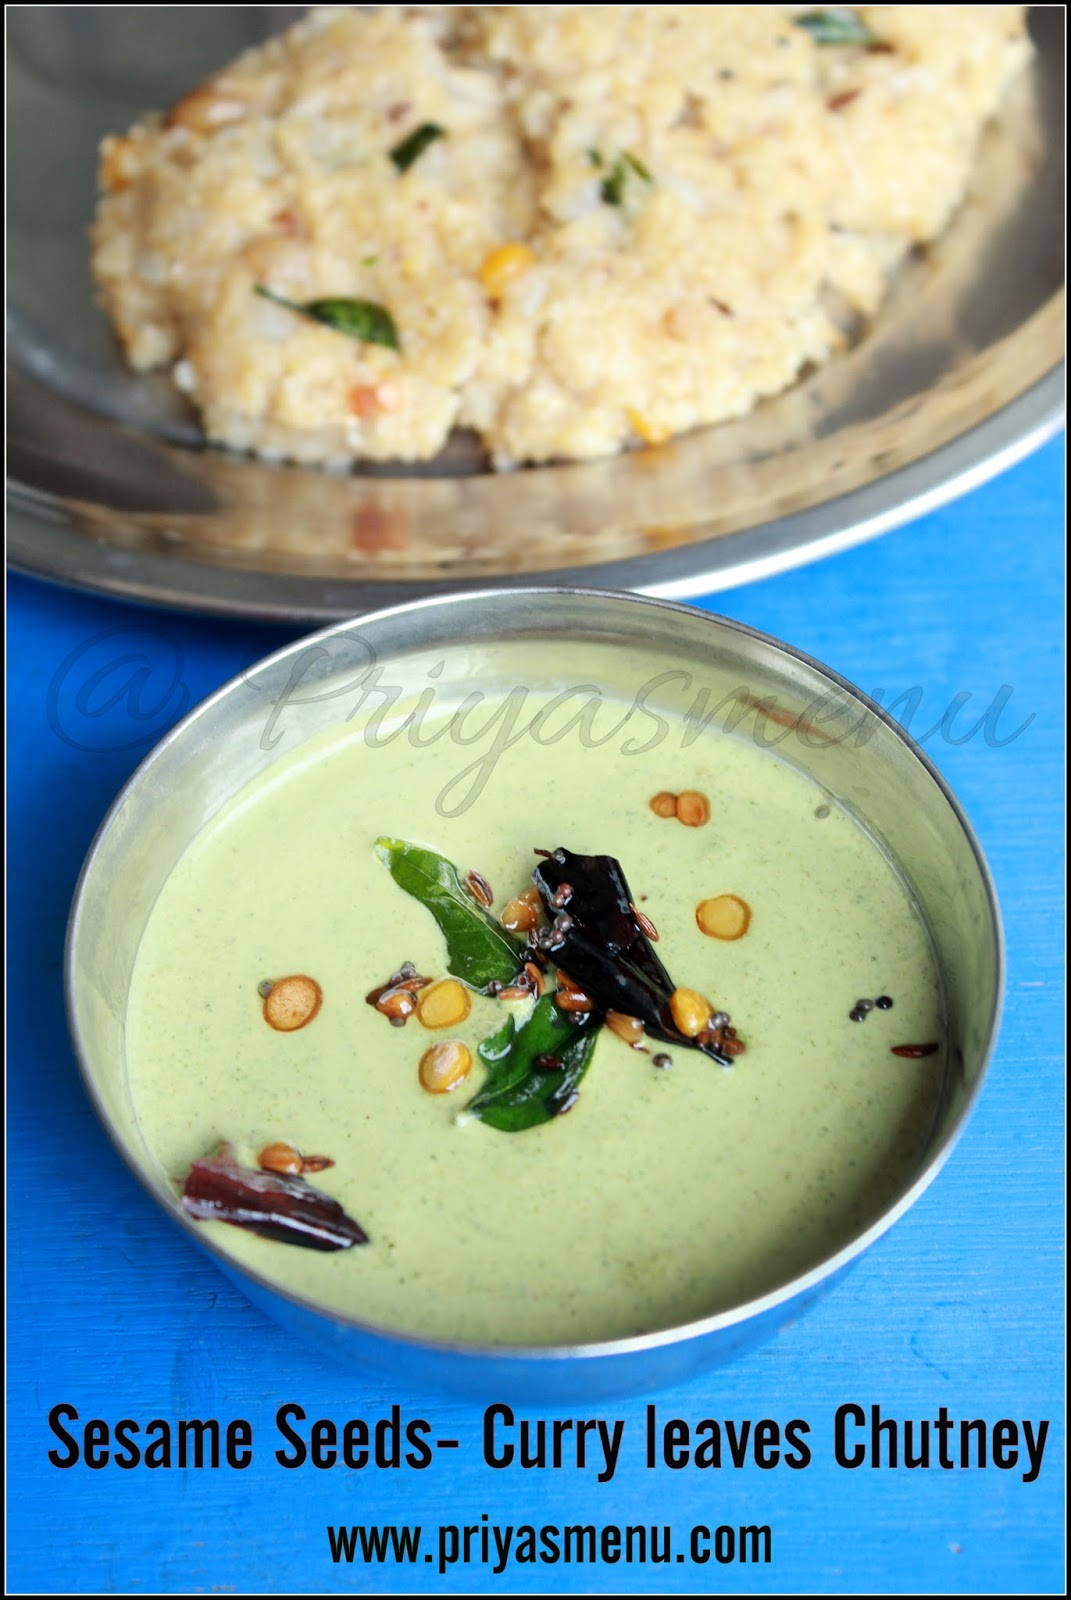 Priya's Menu - Yum Yum Yummy food for Food lovers !: Sesame seeds